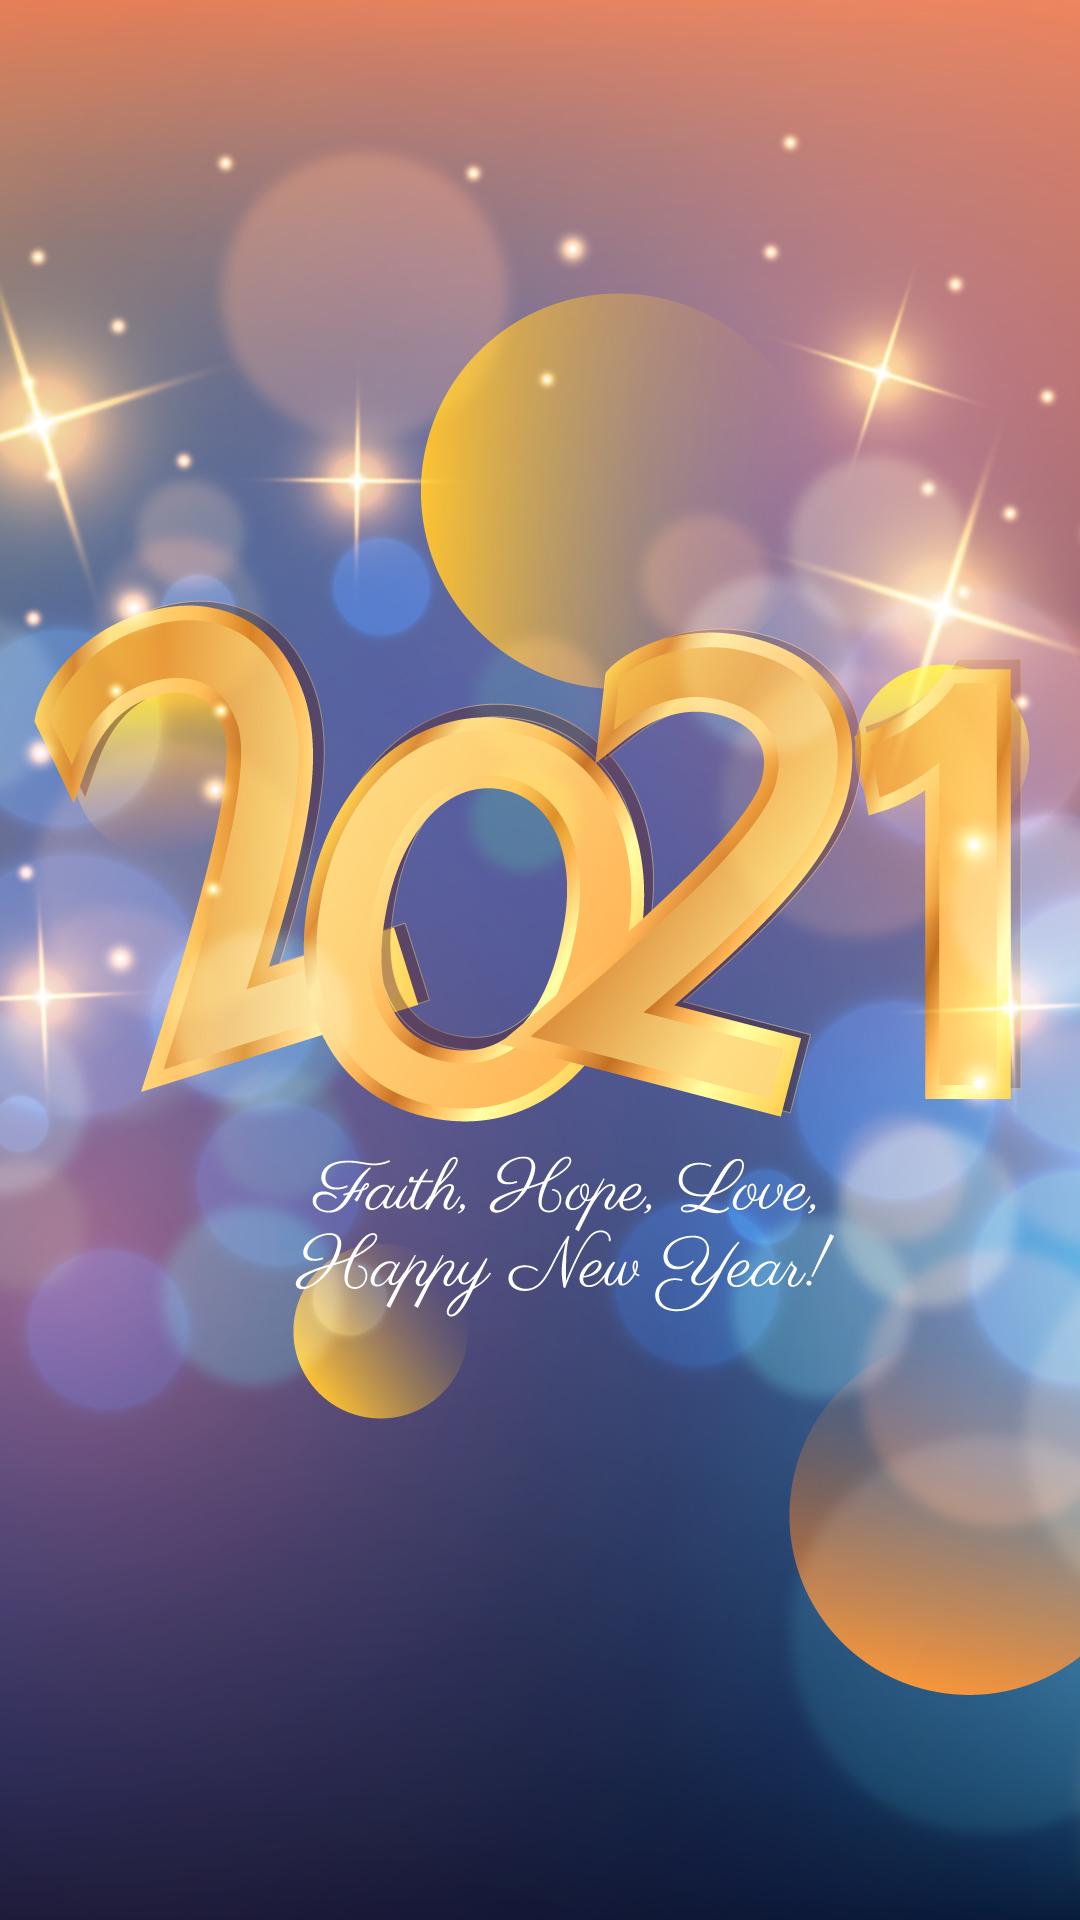 2021 Faith Hope Love Happy New Year